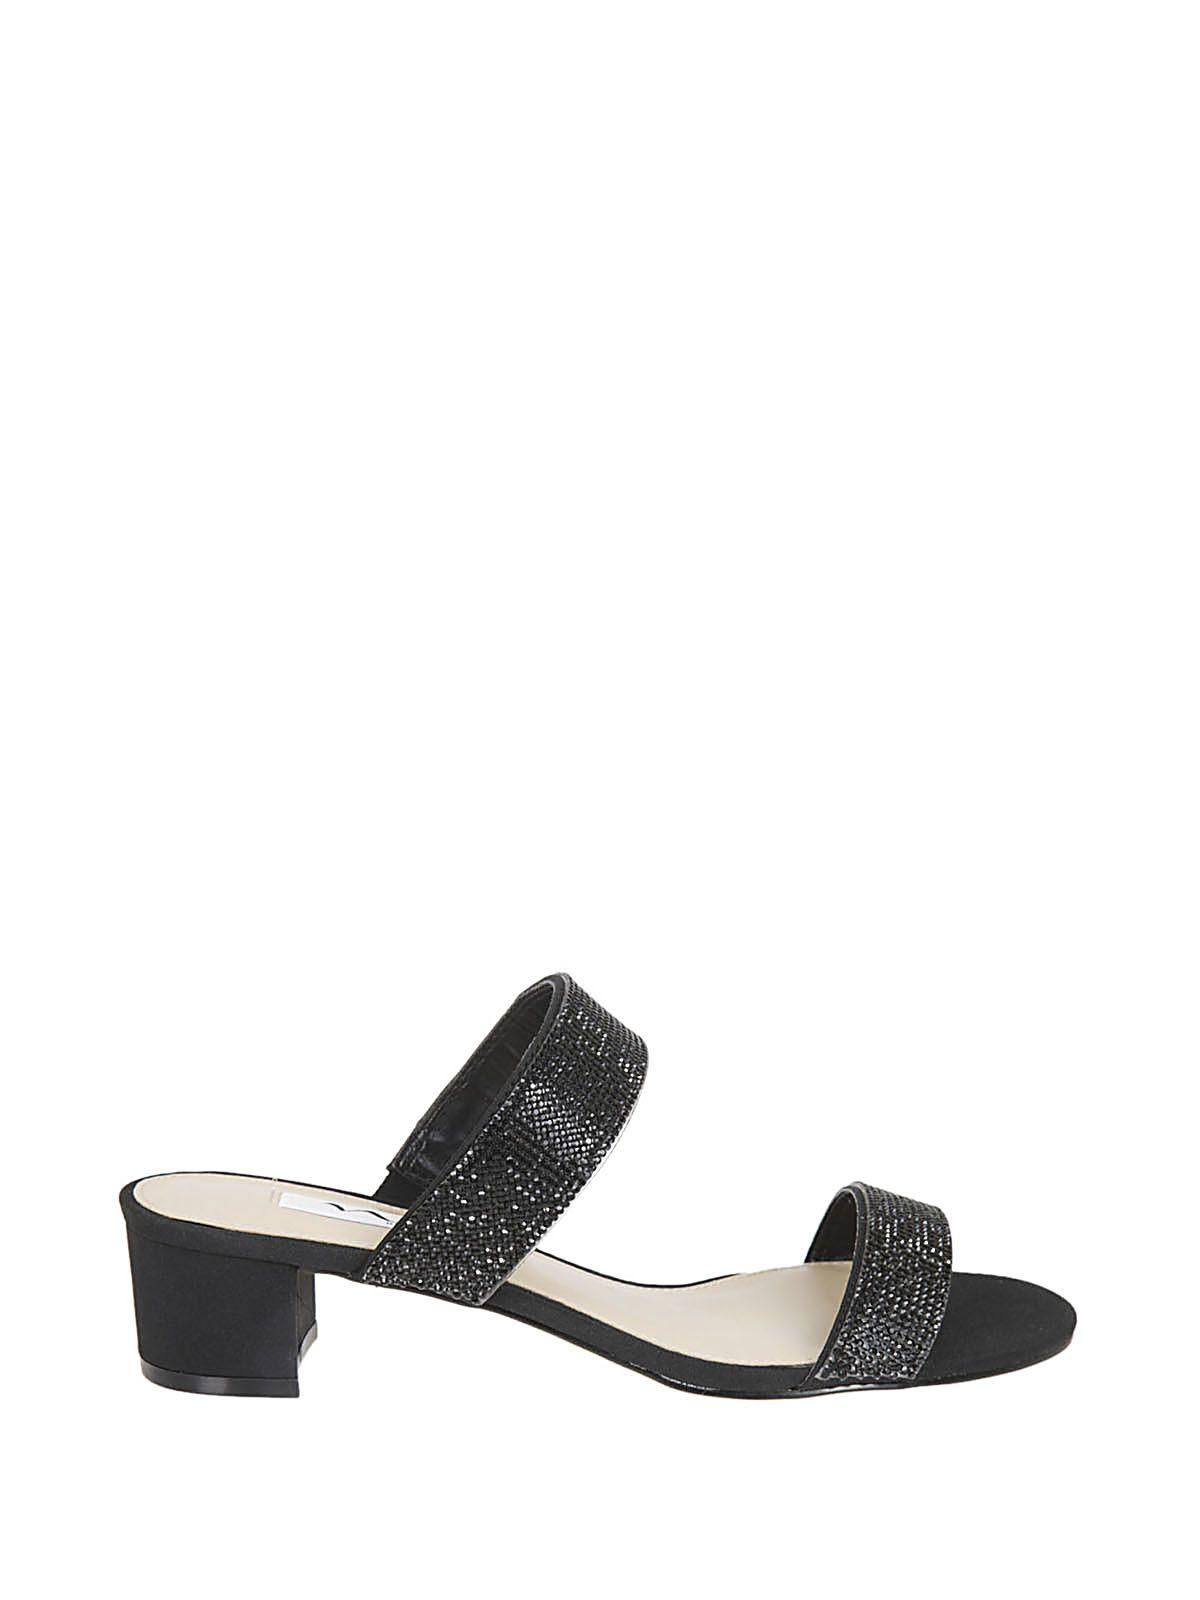 Outlet Online Shop Low Price NINA Georgia Glittery Sandals Buy Cheap Original Original Cheap Price pGcK7EJO